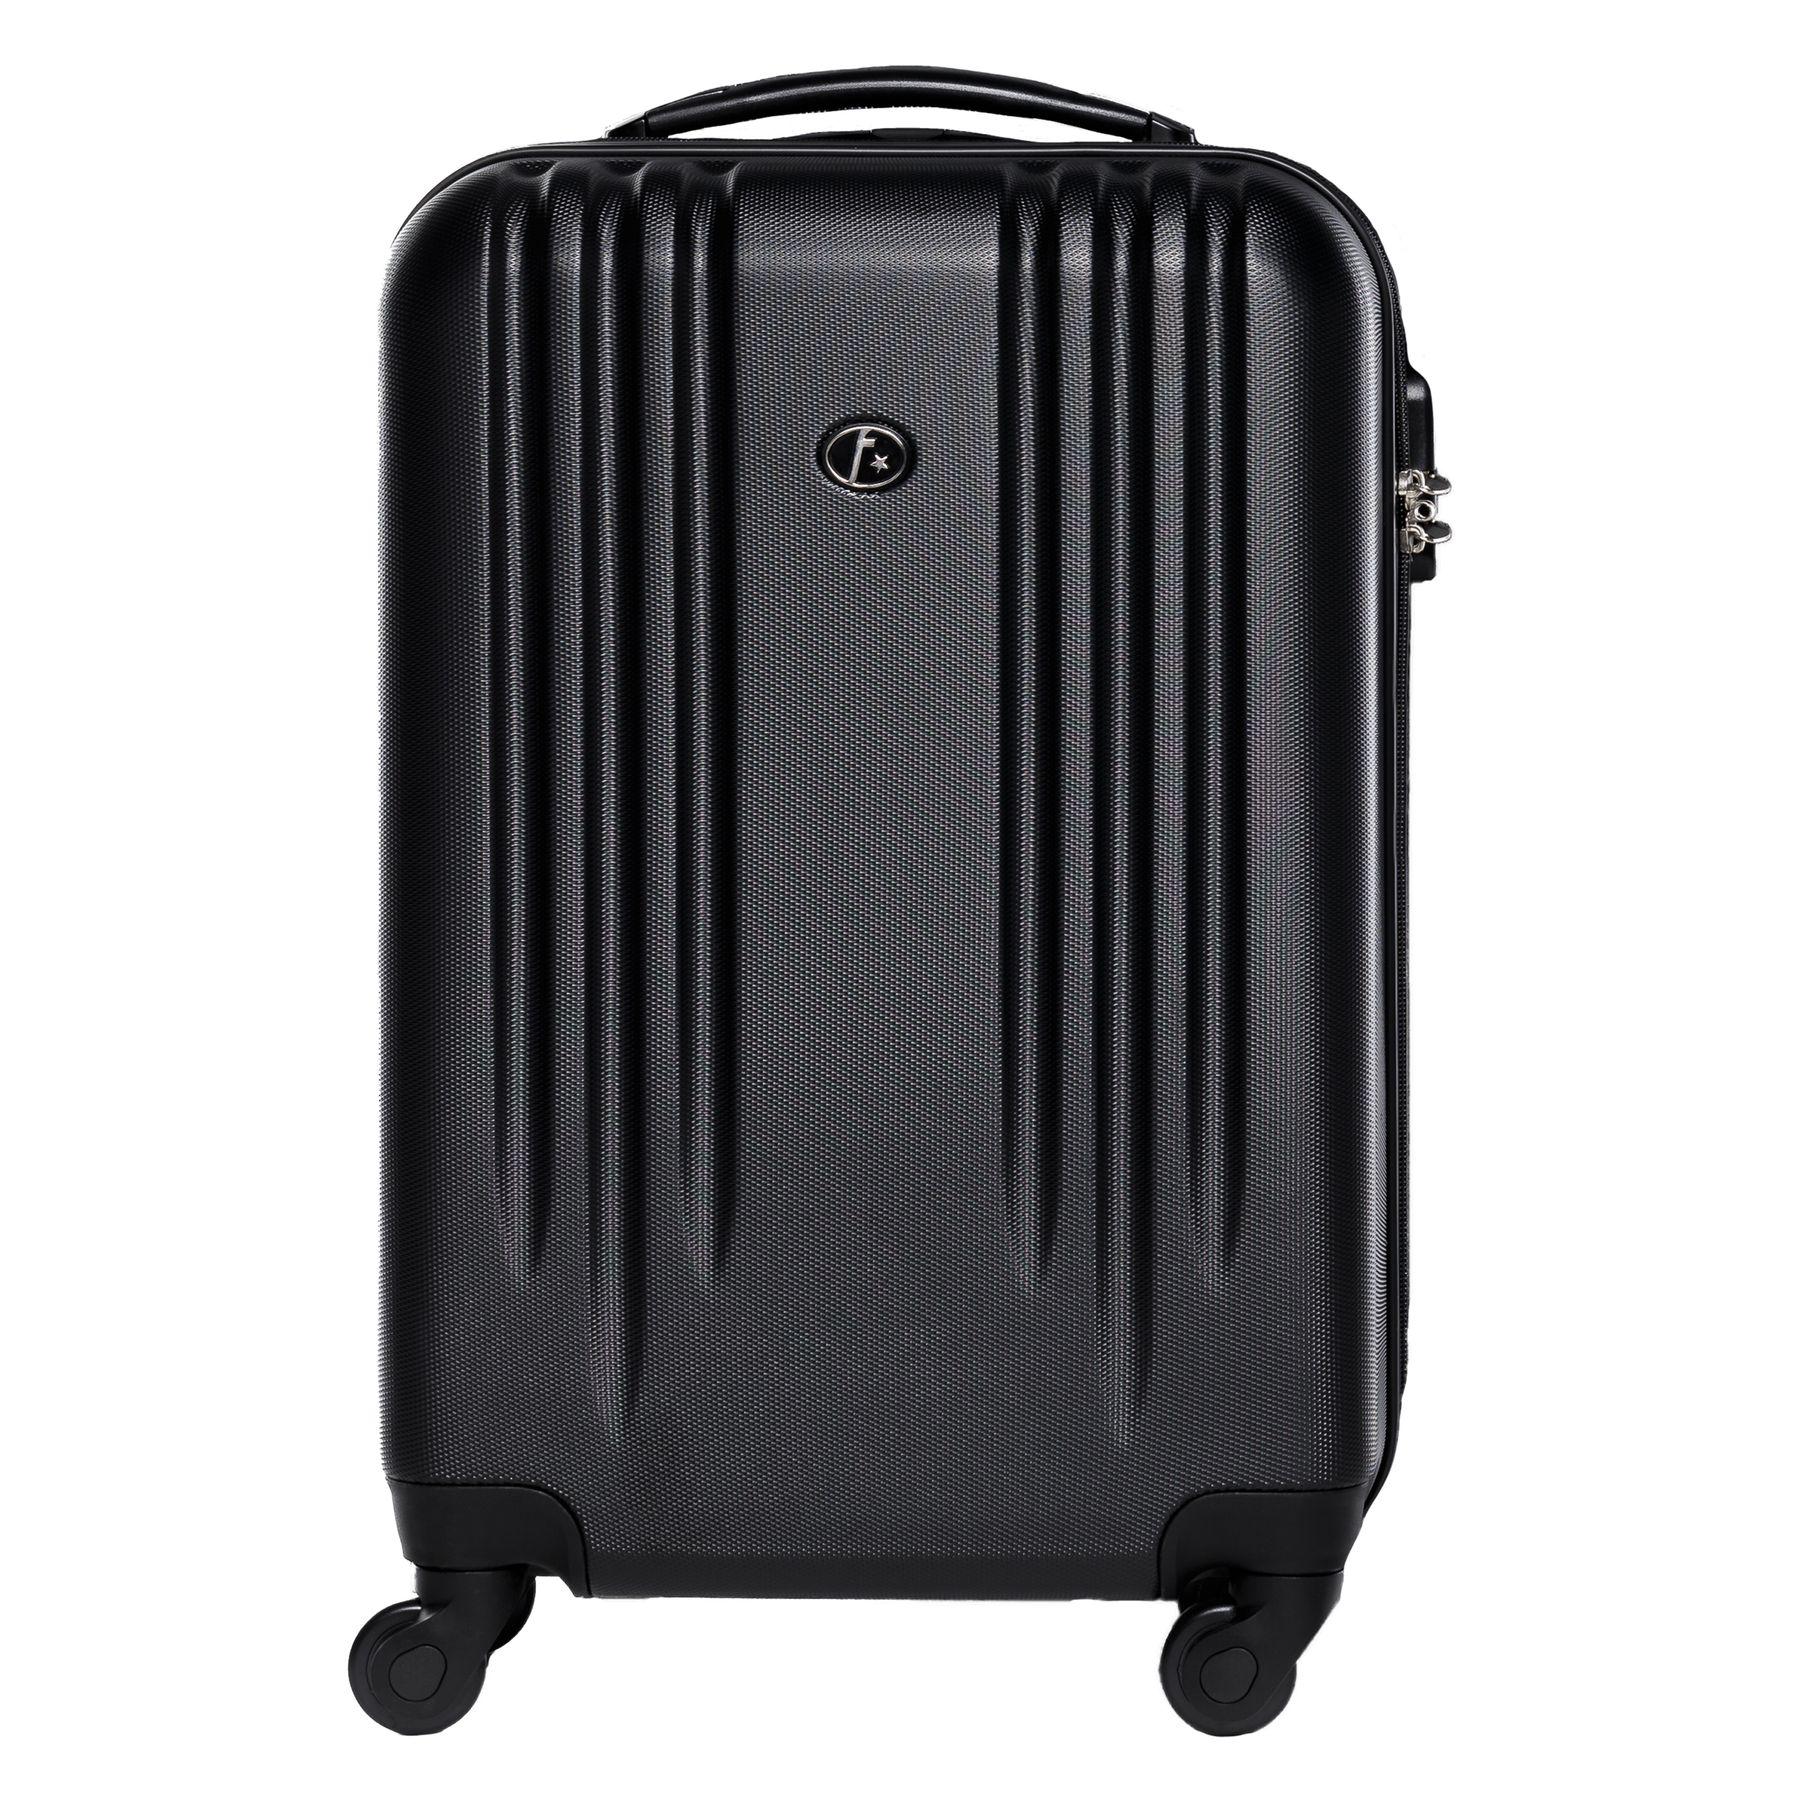 handgep ck hartschalen koffer trolley kabinen bordgep ck 55cm 4 rollen schwarz ebay. Black Bedroom Furniture Sets. Home Design Ideas